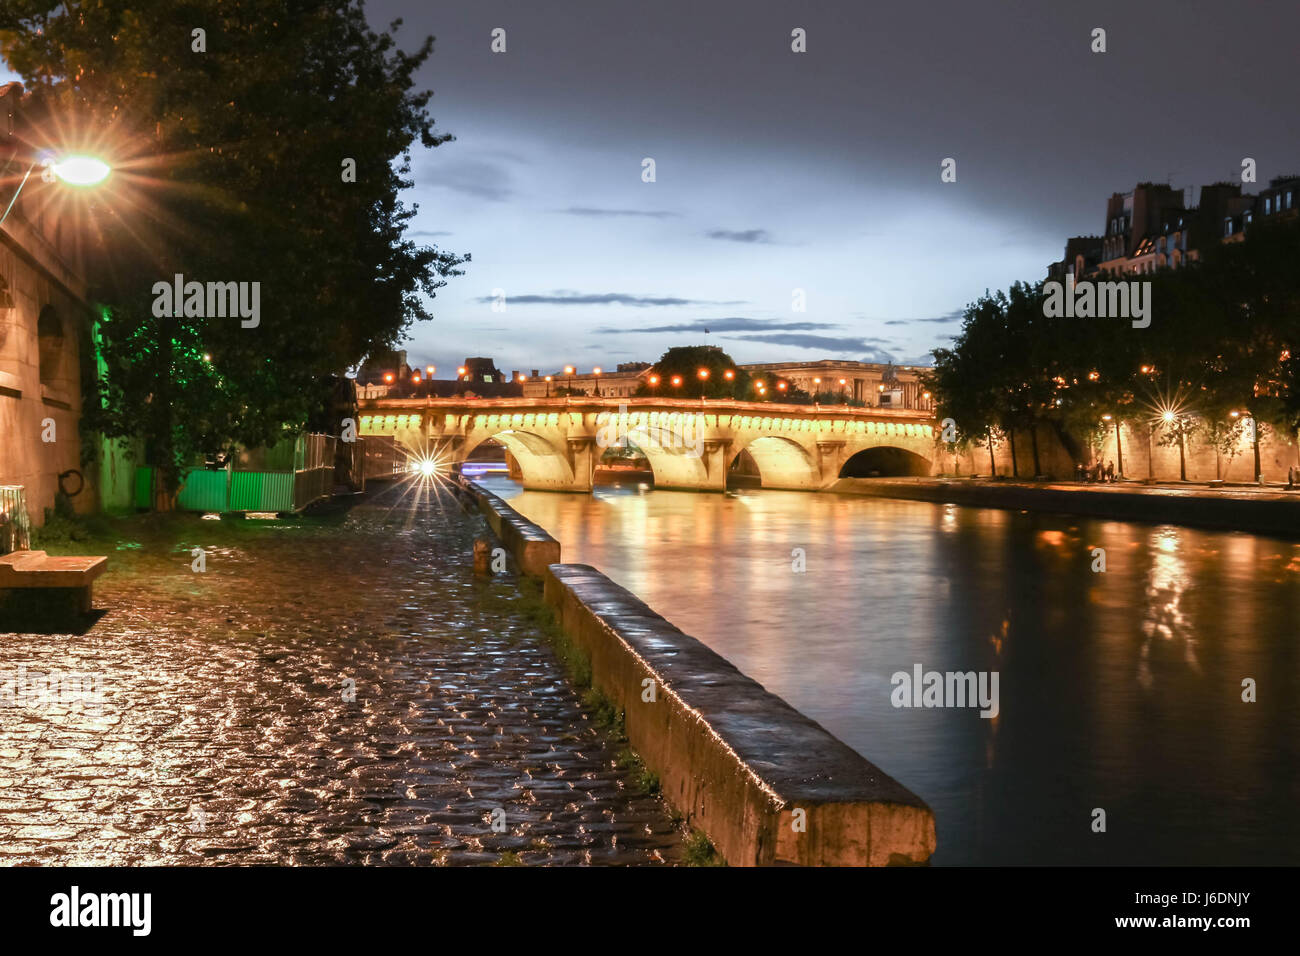 Il Pont Neuf (Neuf ponte) di Parigi all'alba. Immagini Stock